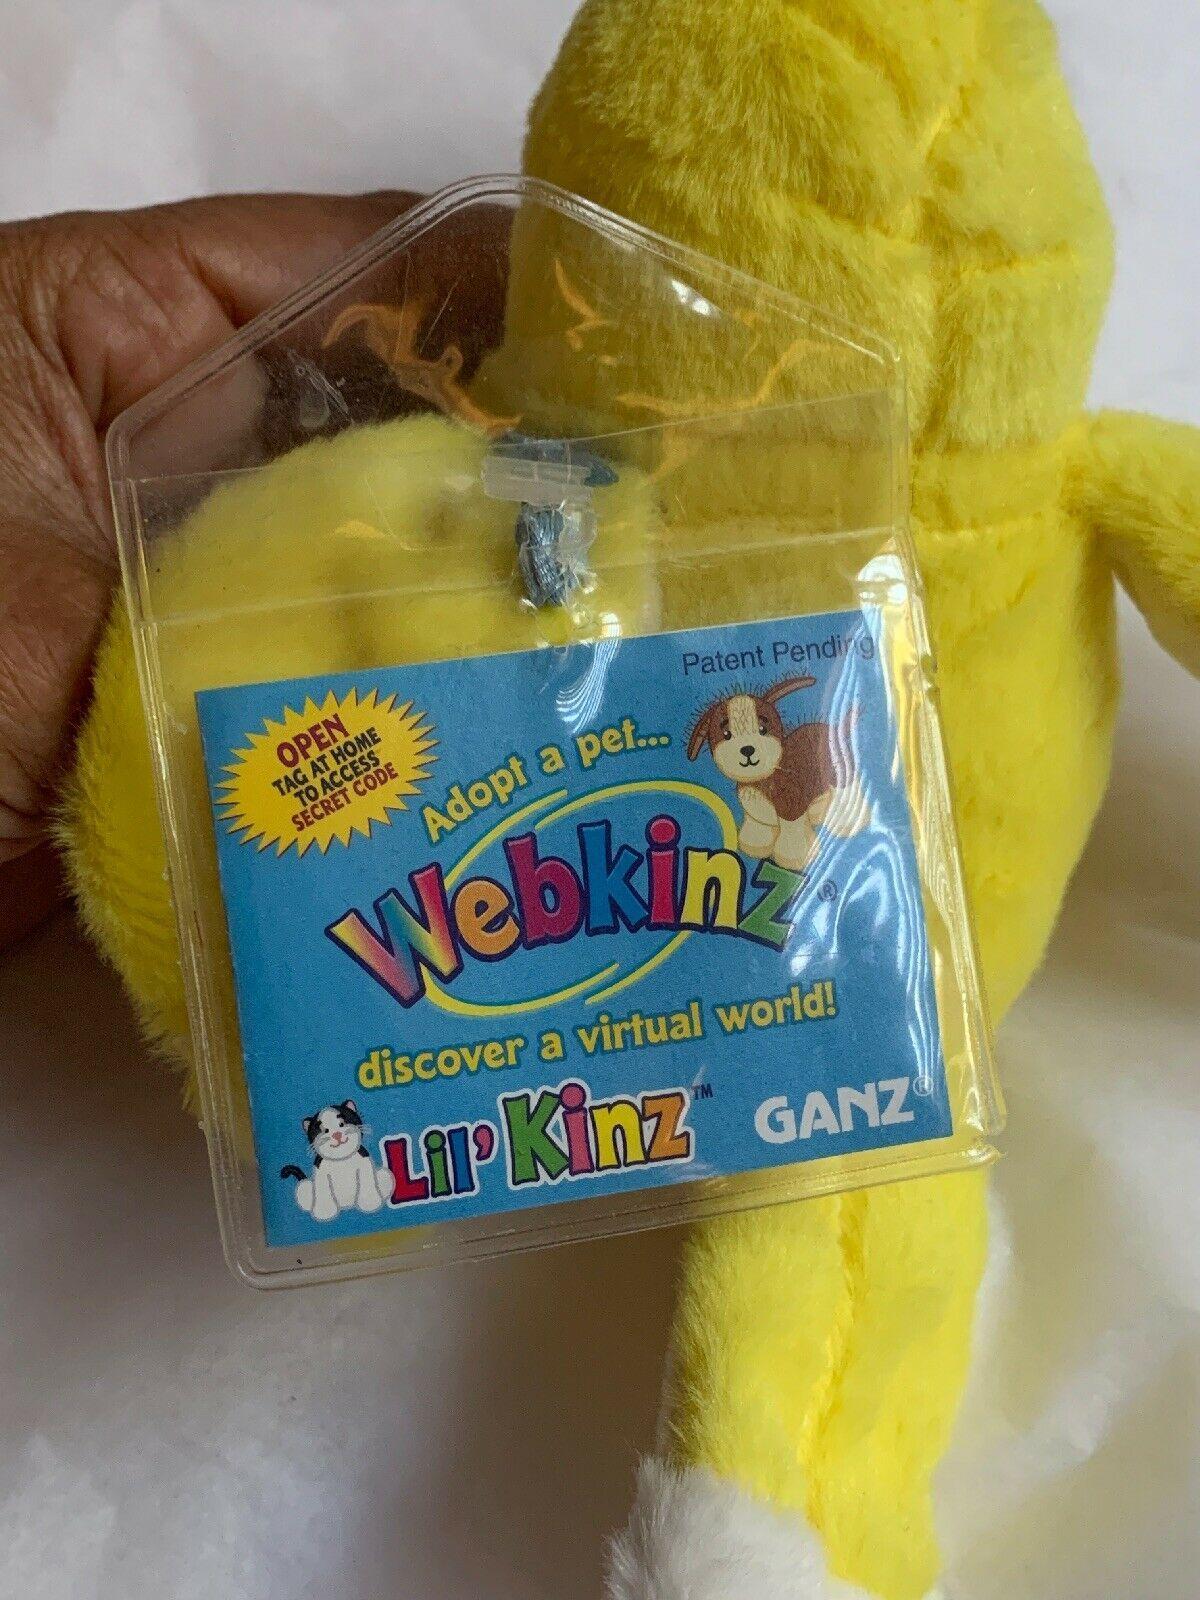 ganz webkinz lil kinz yellow canary bird plush w Code Card • Used Doll Toy Cute image 8